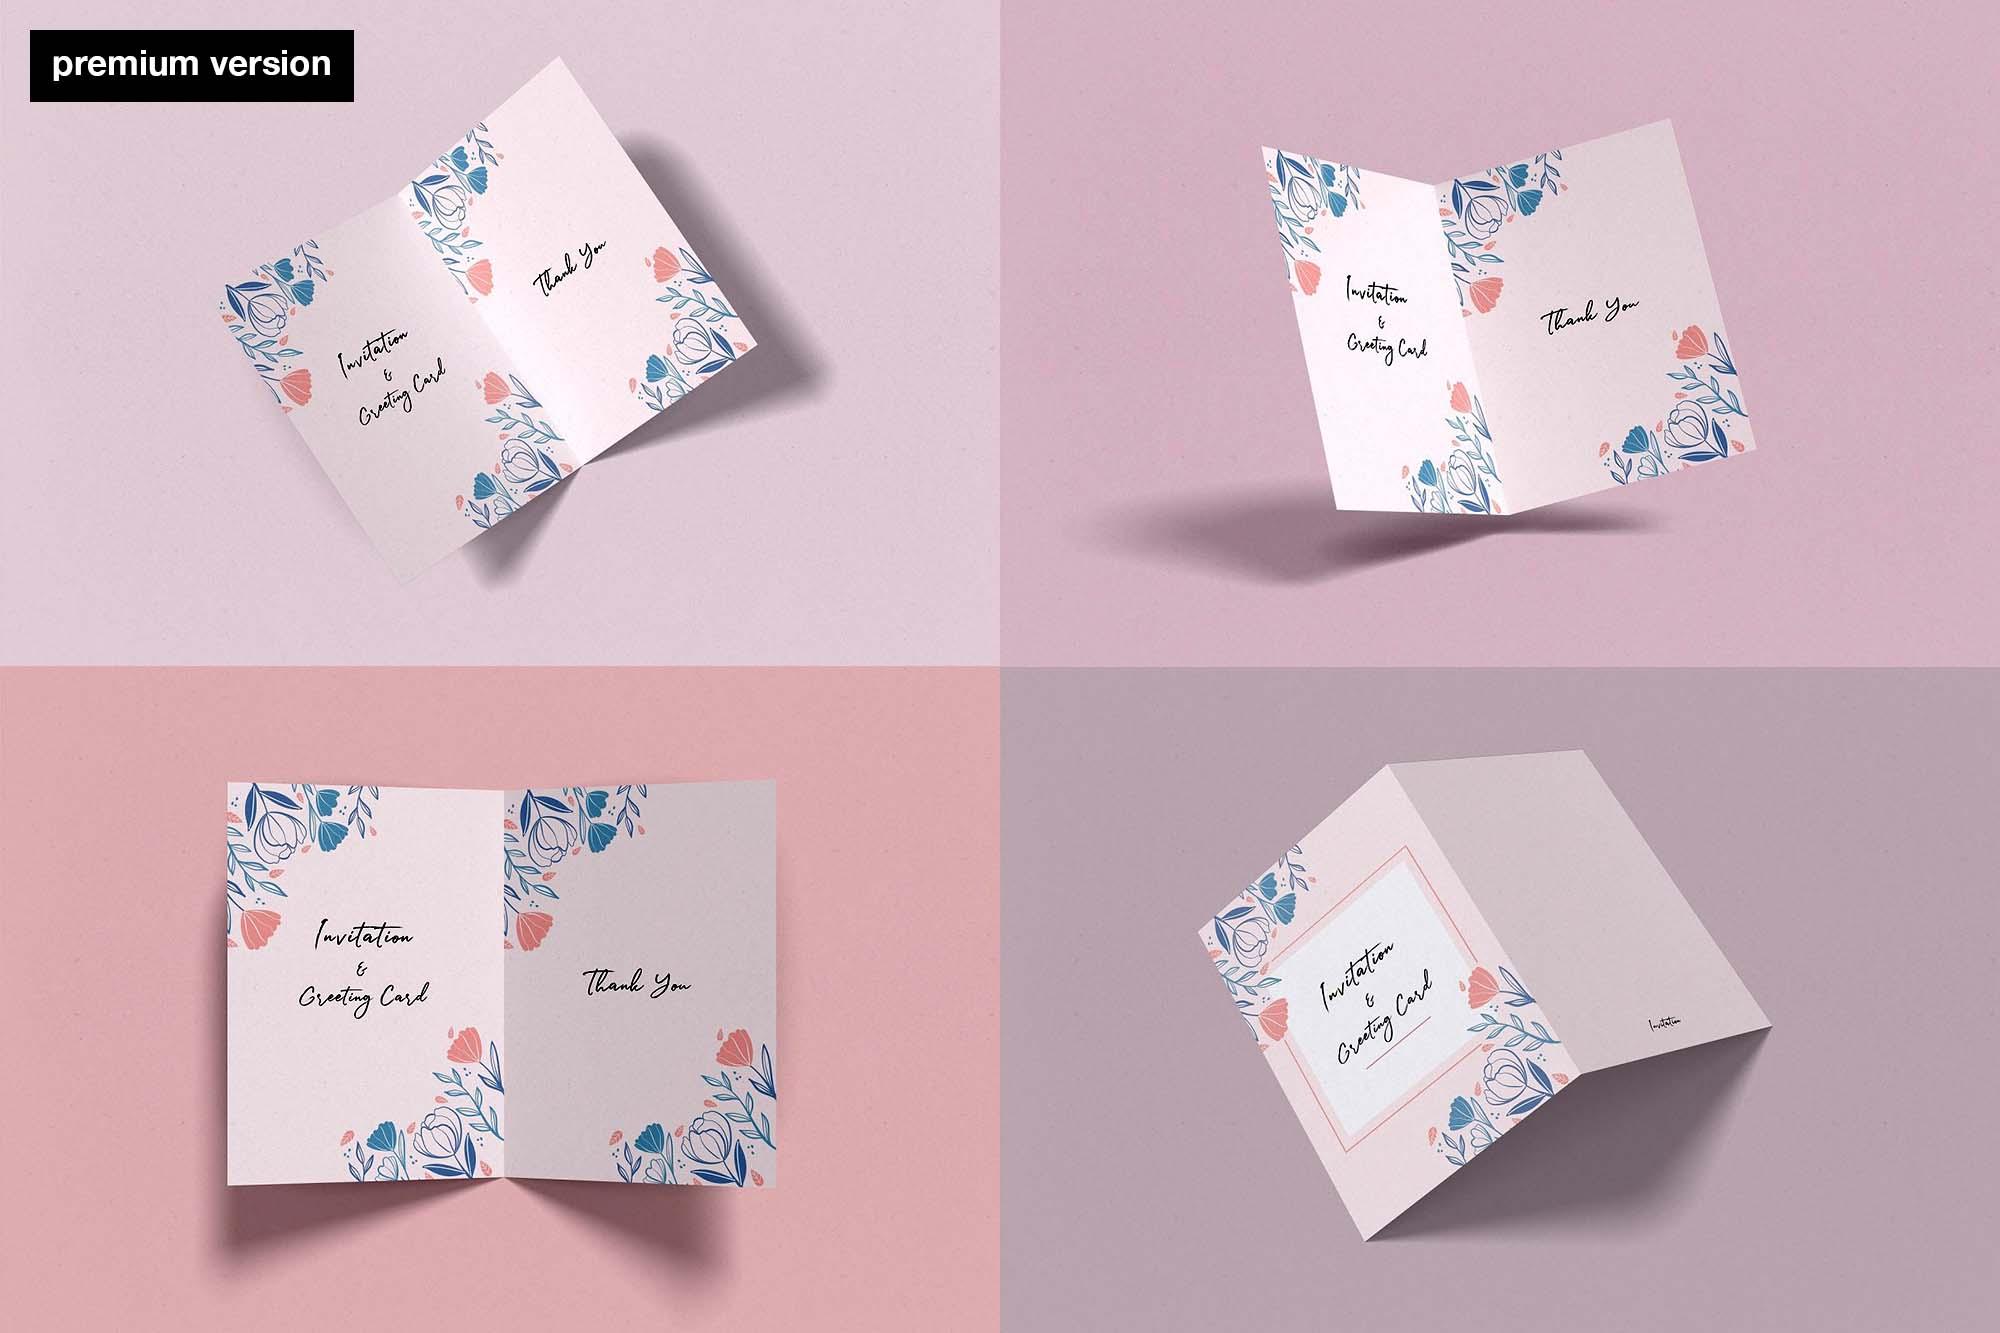 Invitation Card Mockup Premium Version